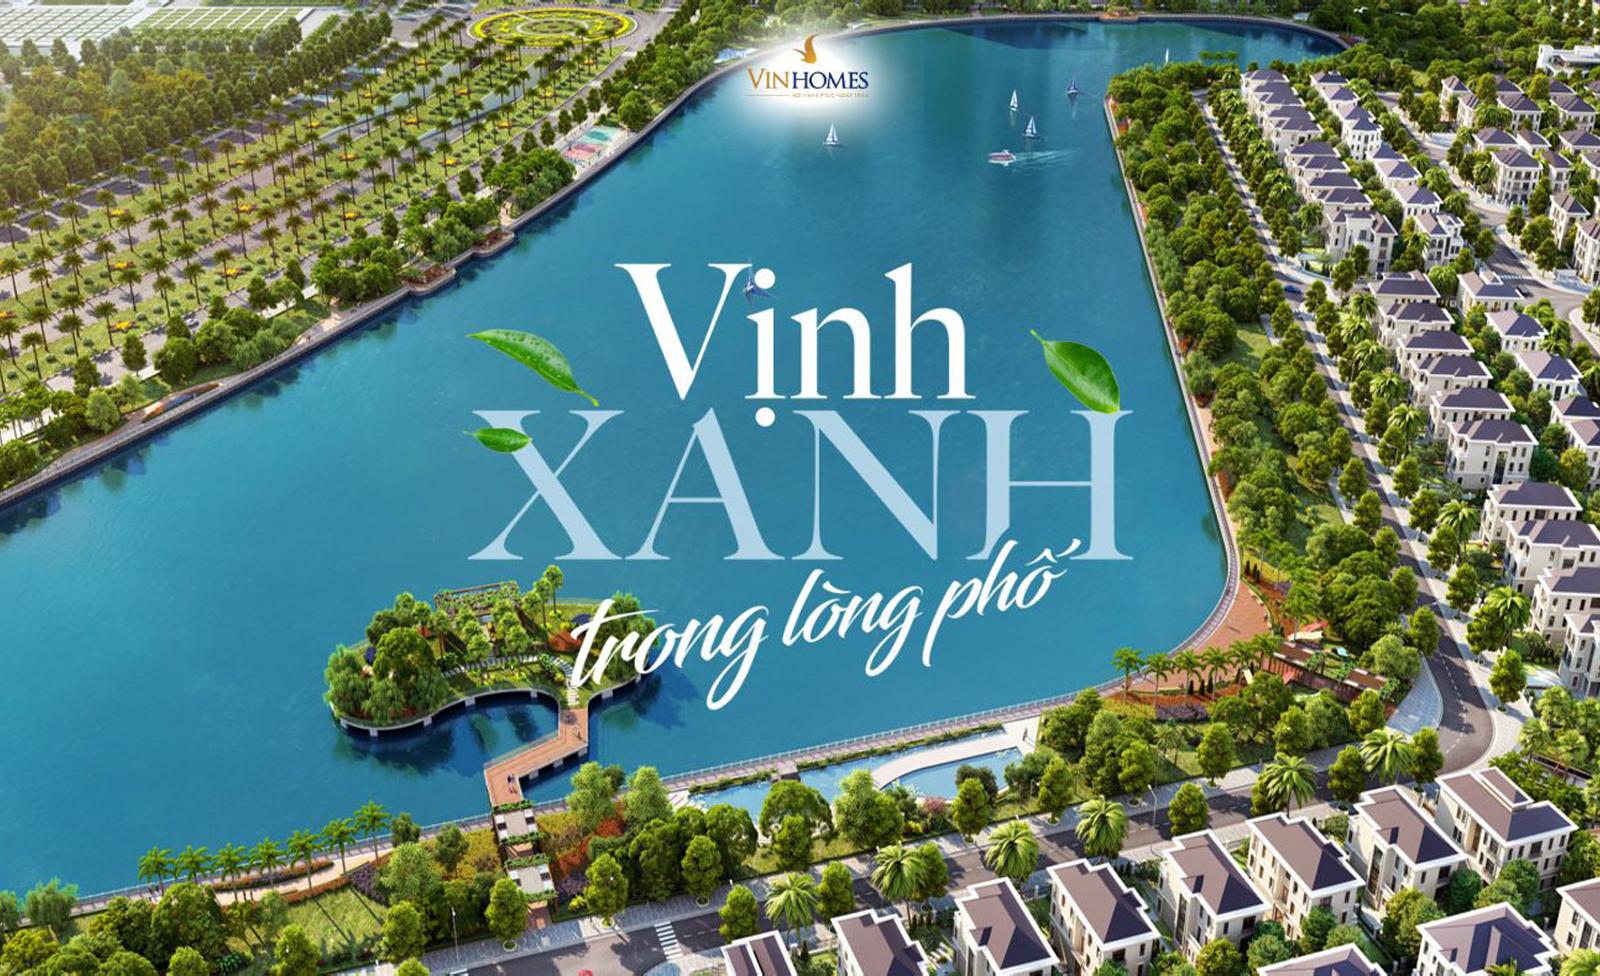 top-10-nha-phat-trien-bat-dong-san-tot-nhat-viet-nam-2017